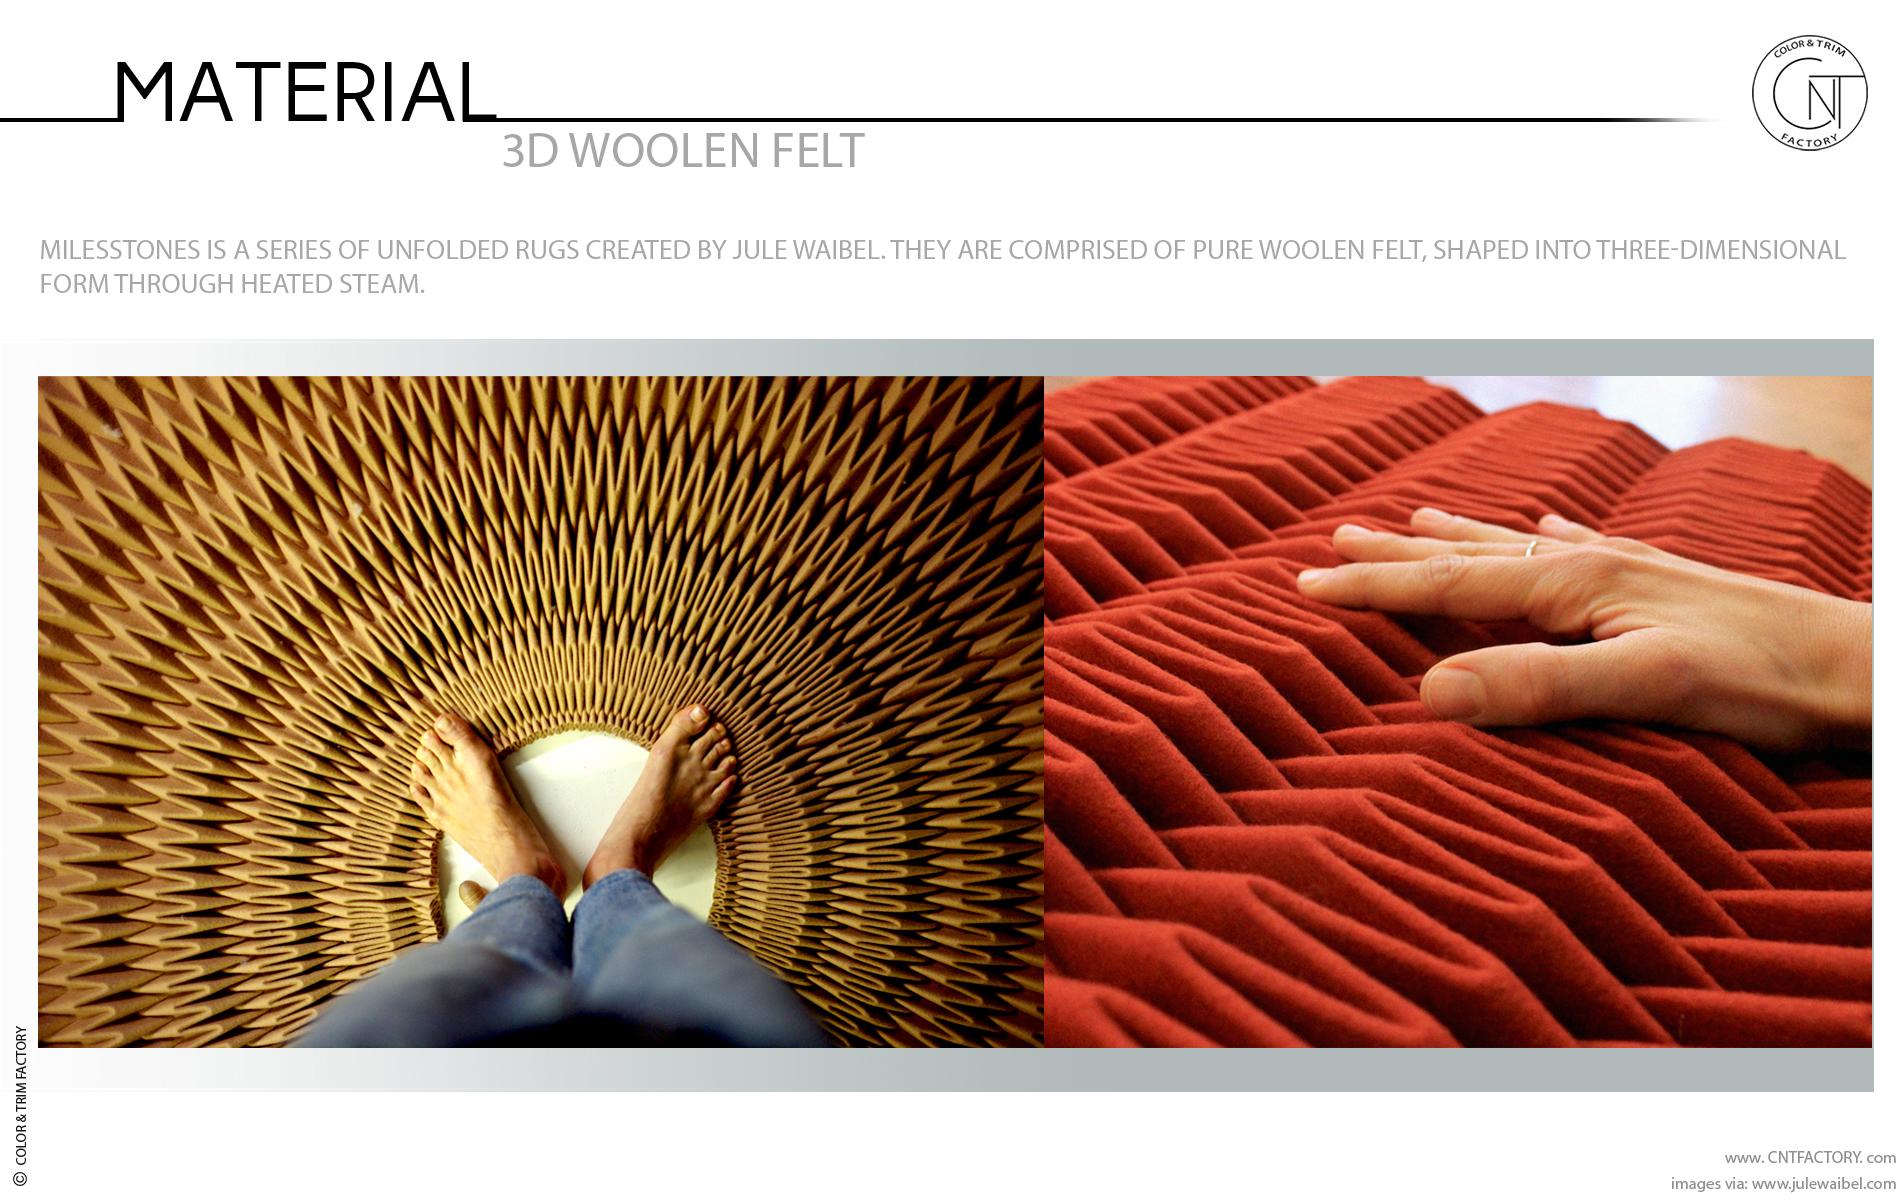 pure woolen felt shaped three dimensional form heated steam